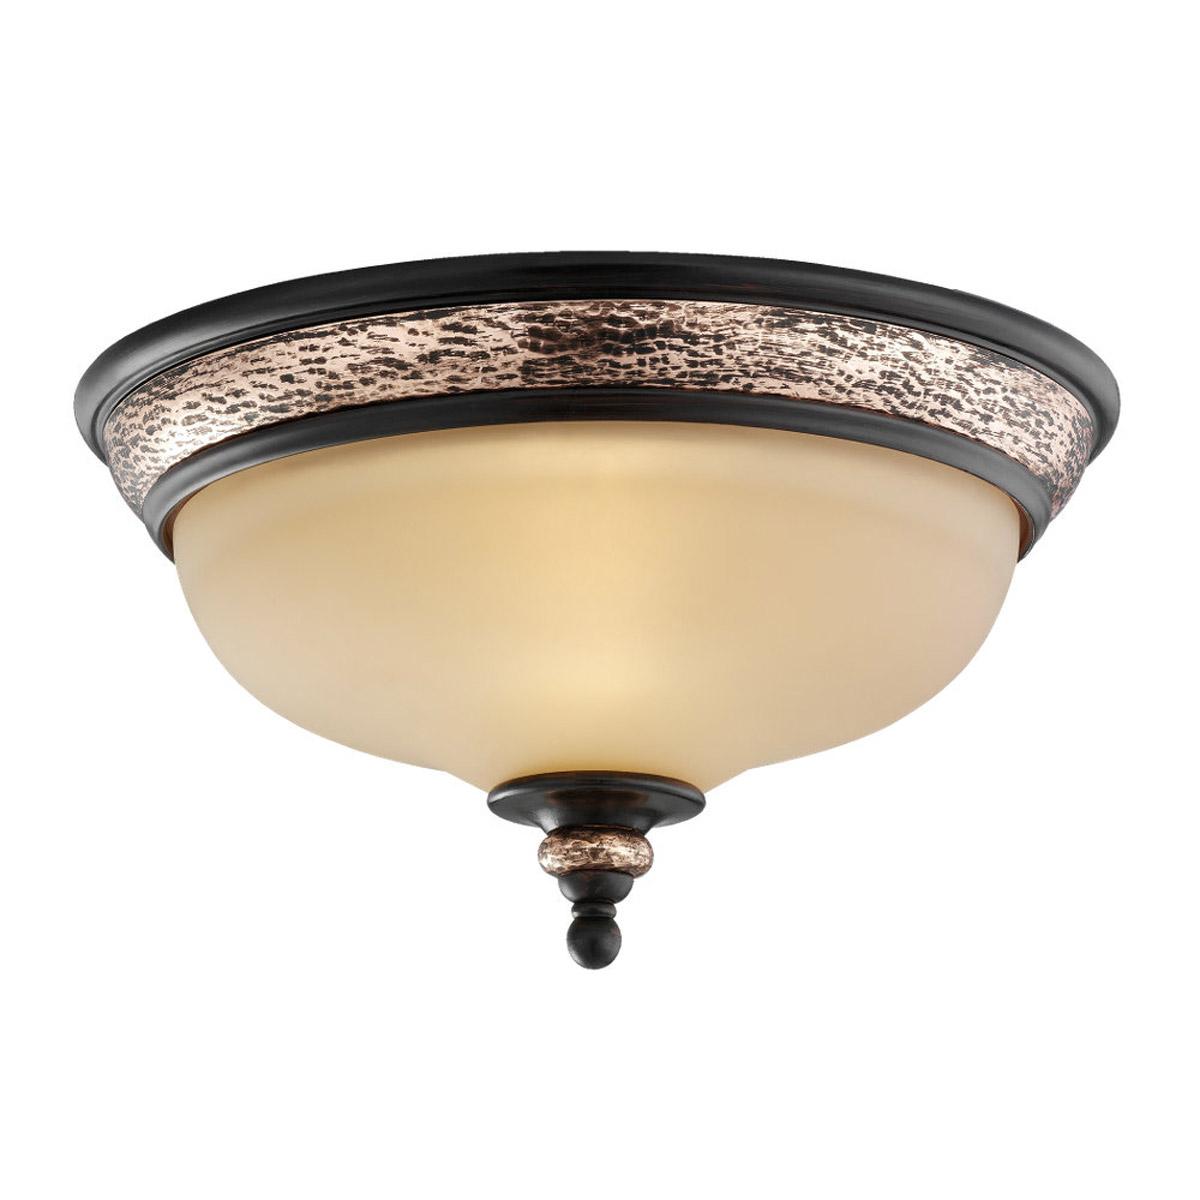 sea gull lighting brixham 2 light flush mount in rustic bronze with. Black Bedroom Furniture Sets. Home Design Ideas